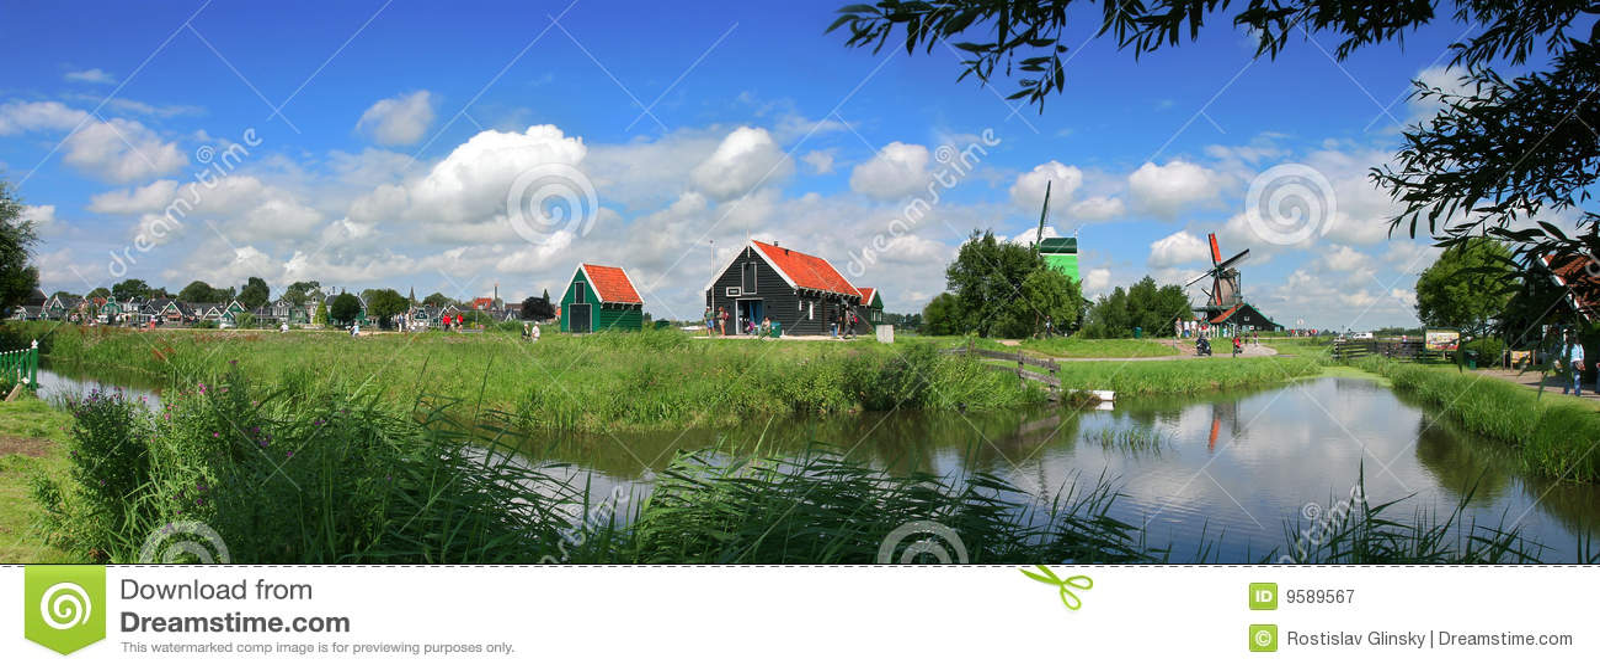 Aldea holandesa.